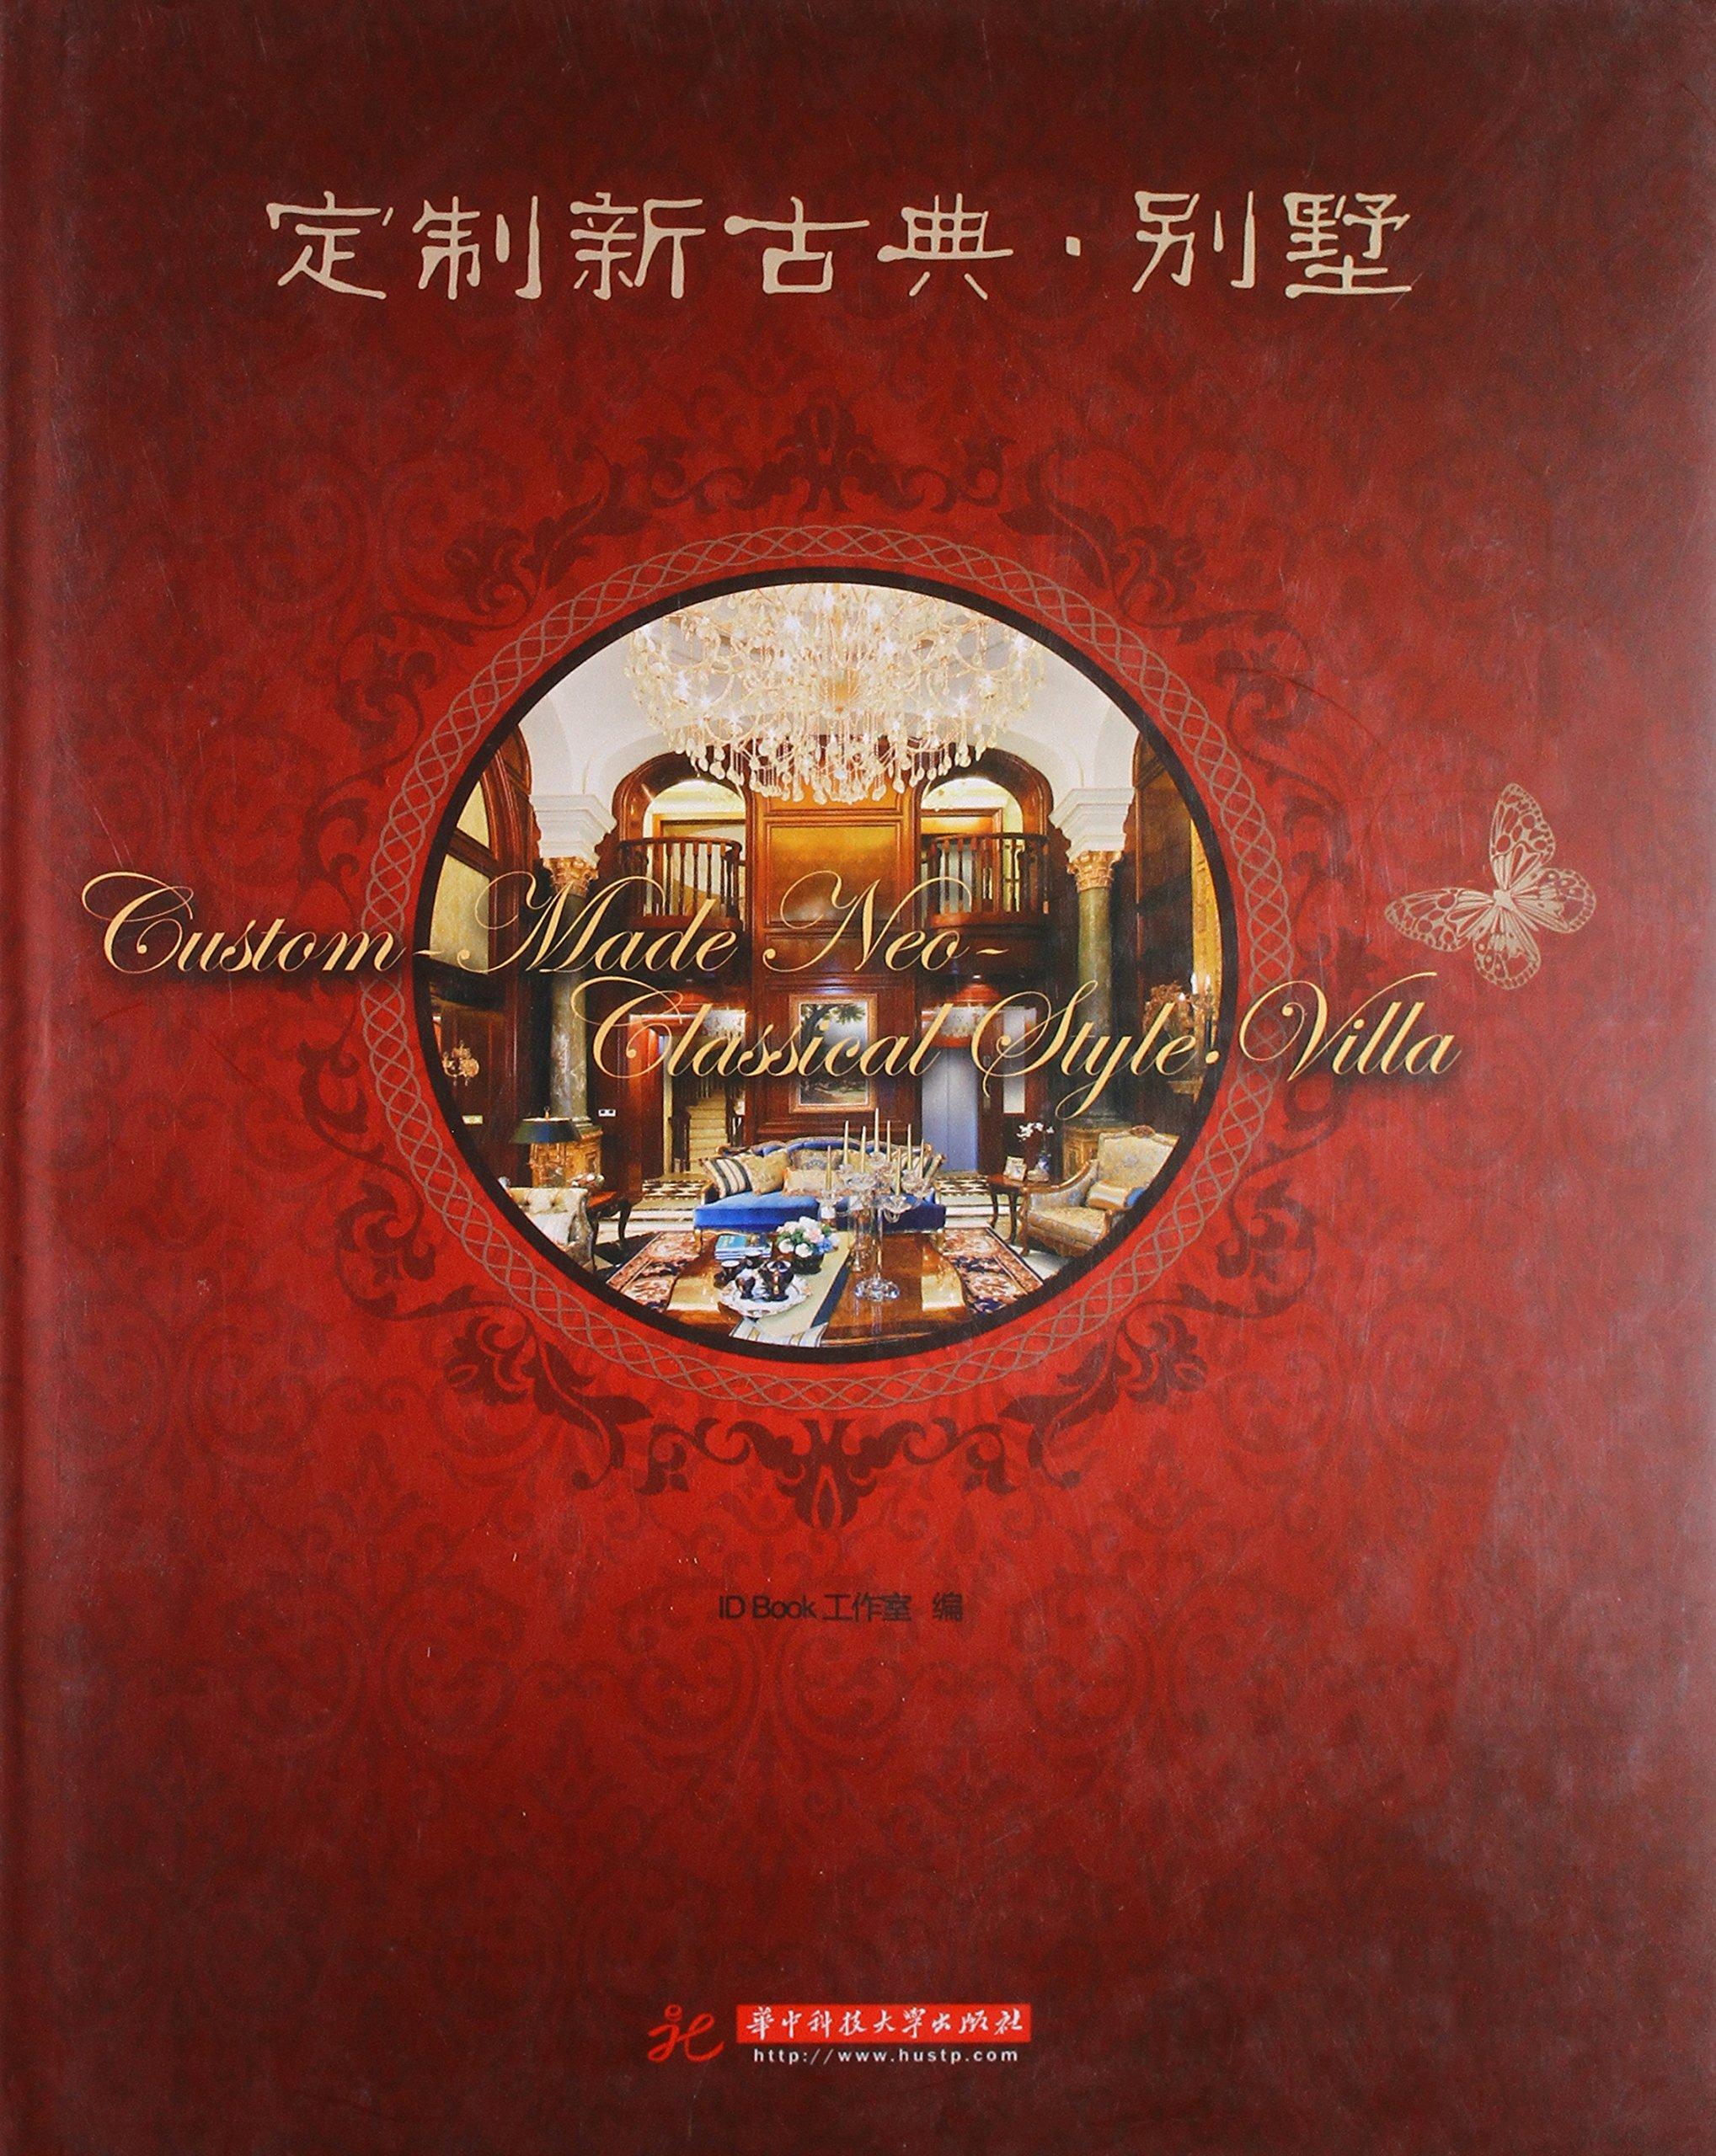 Read Online Customize neoclassical. Villa(Chinese Edition) pdf epub